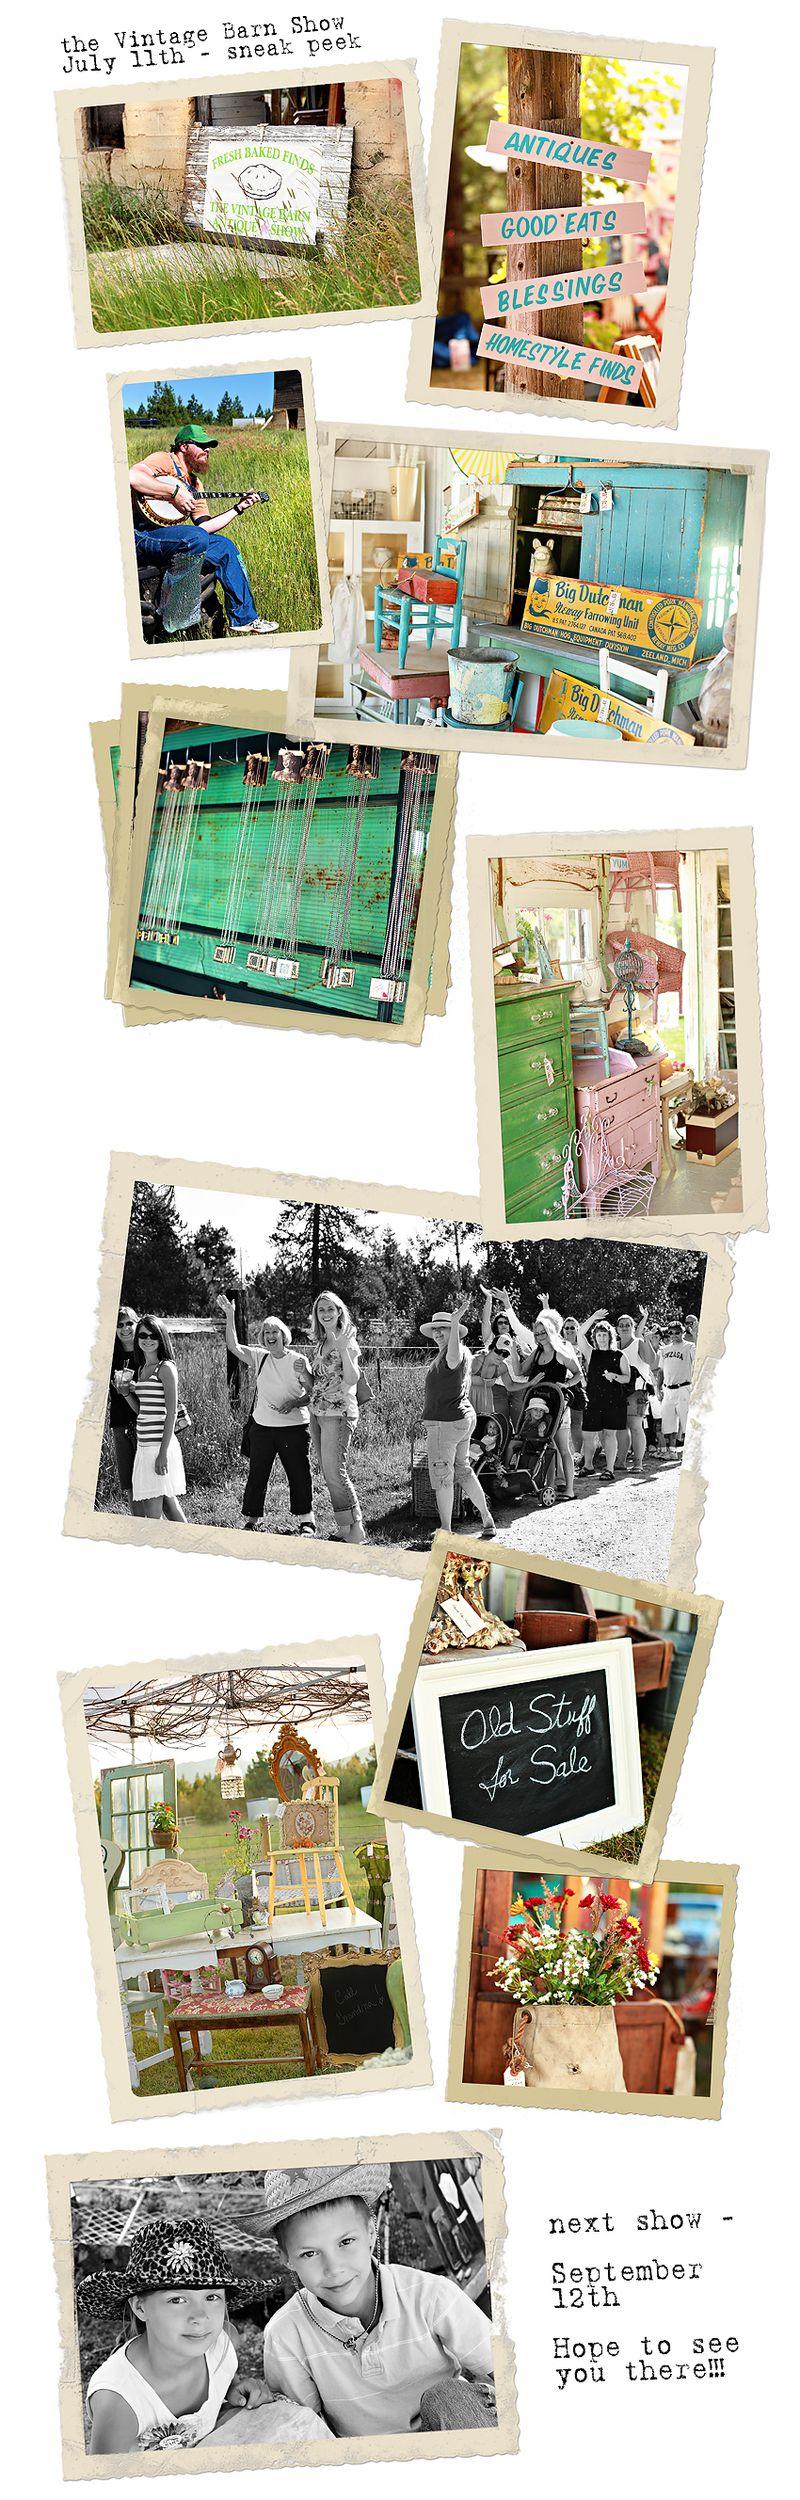 Vintage barn july11a